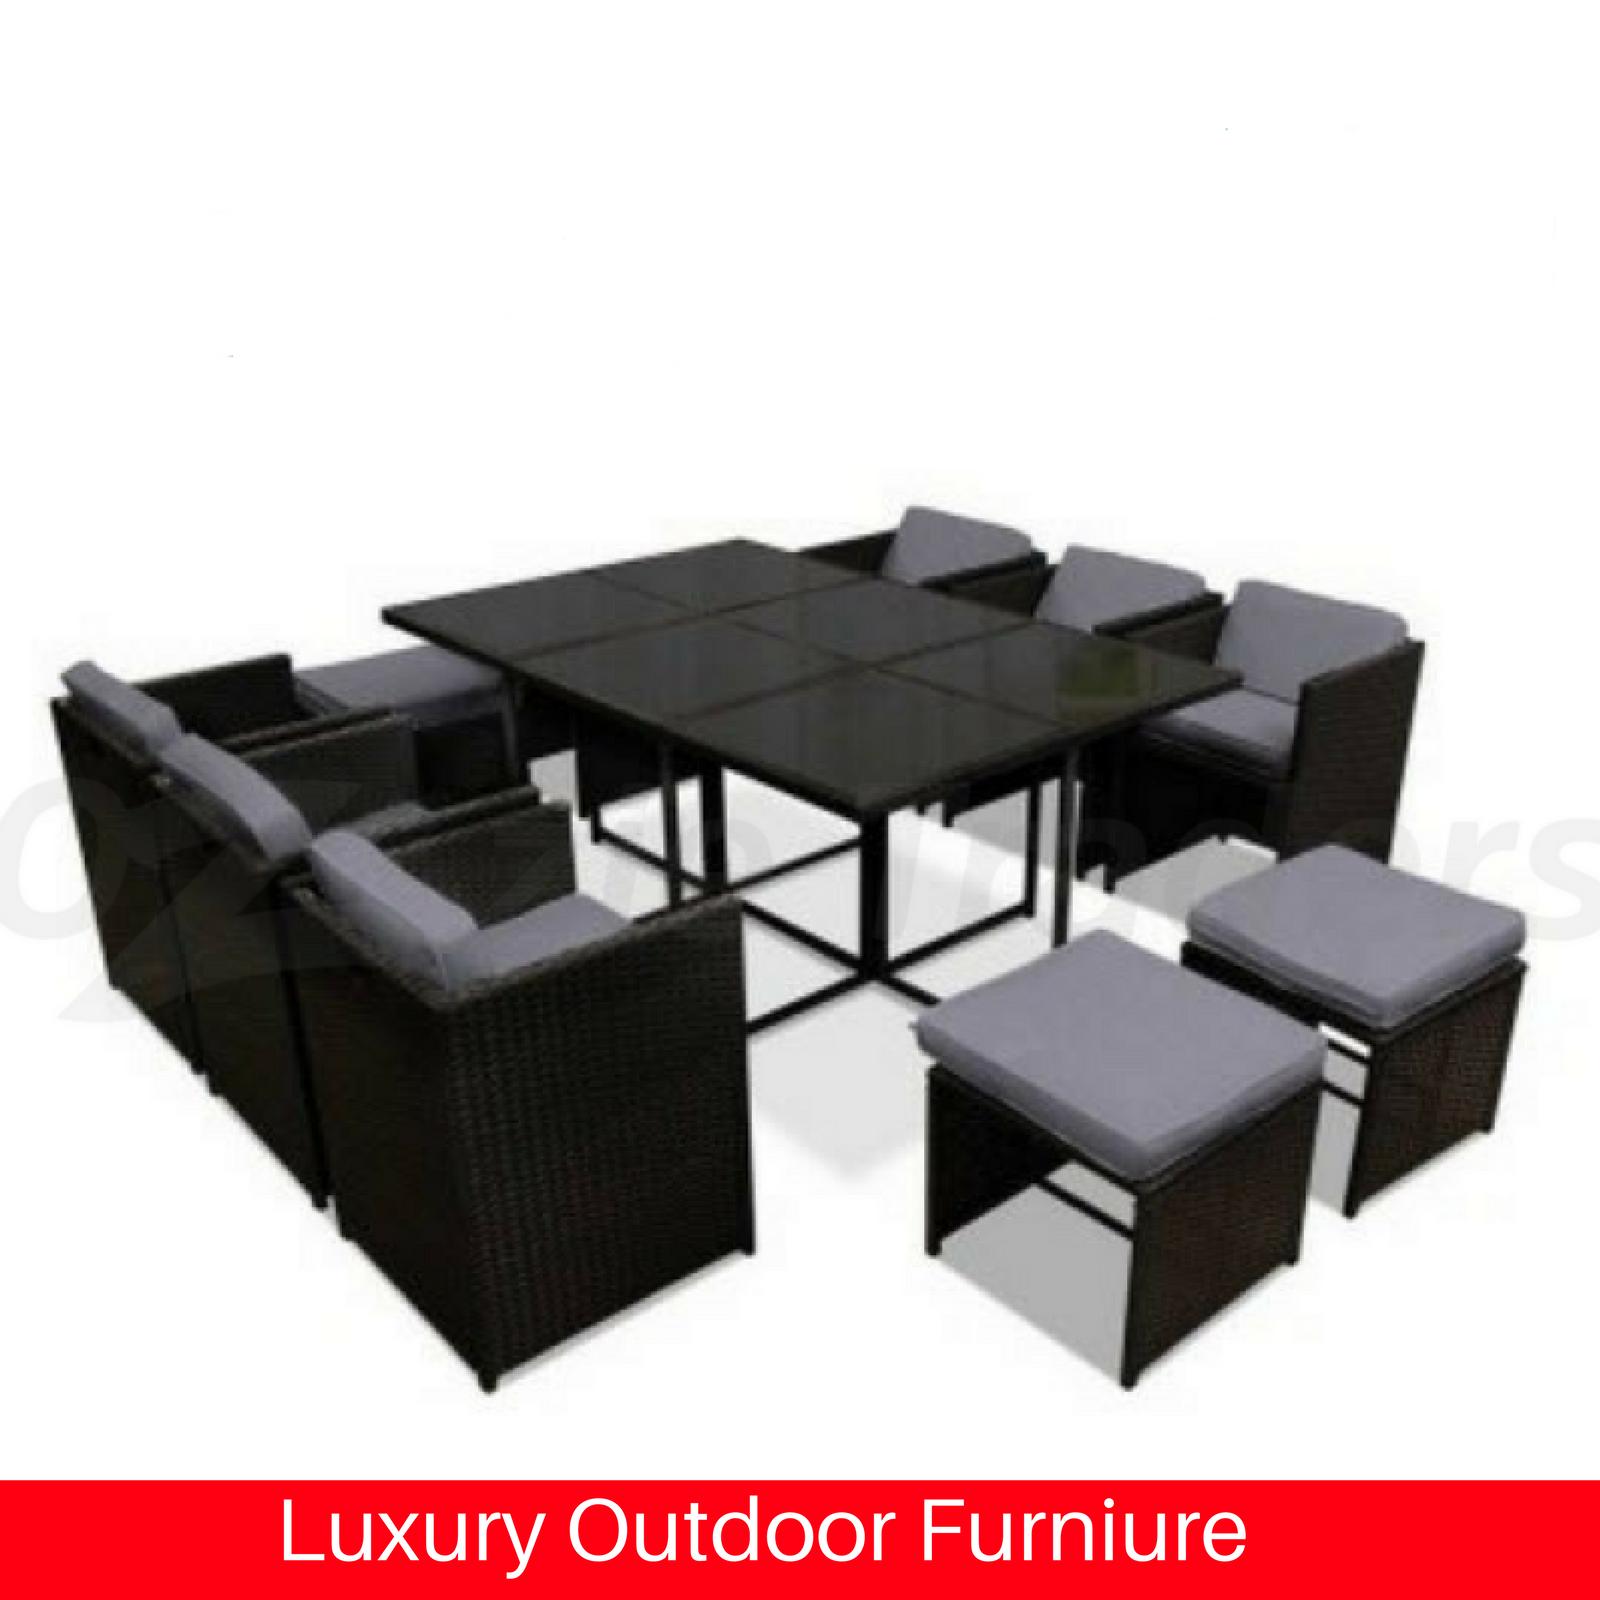 Outdoor dining furniture wicker luxury patio setting for Luxury outdoor furniture